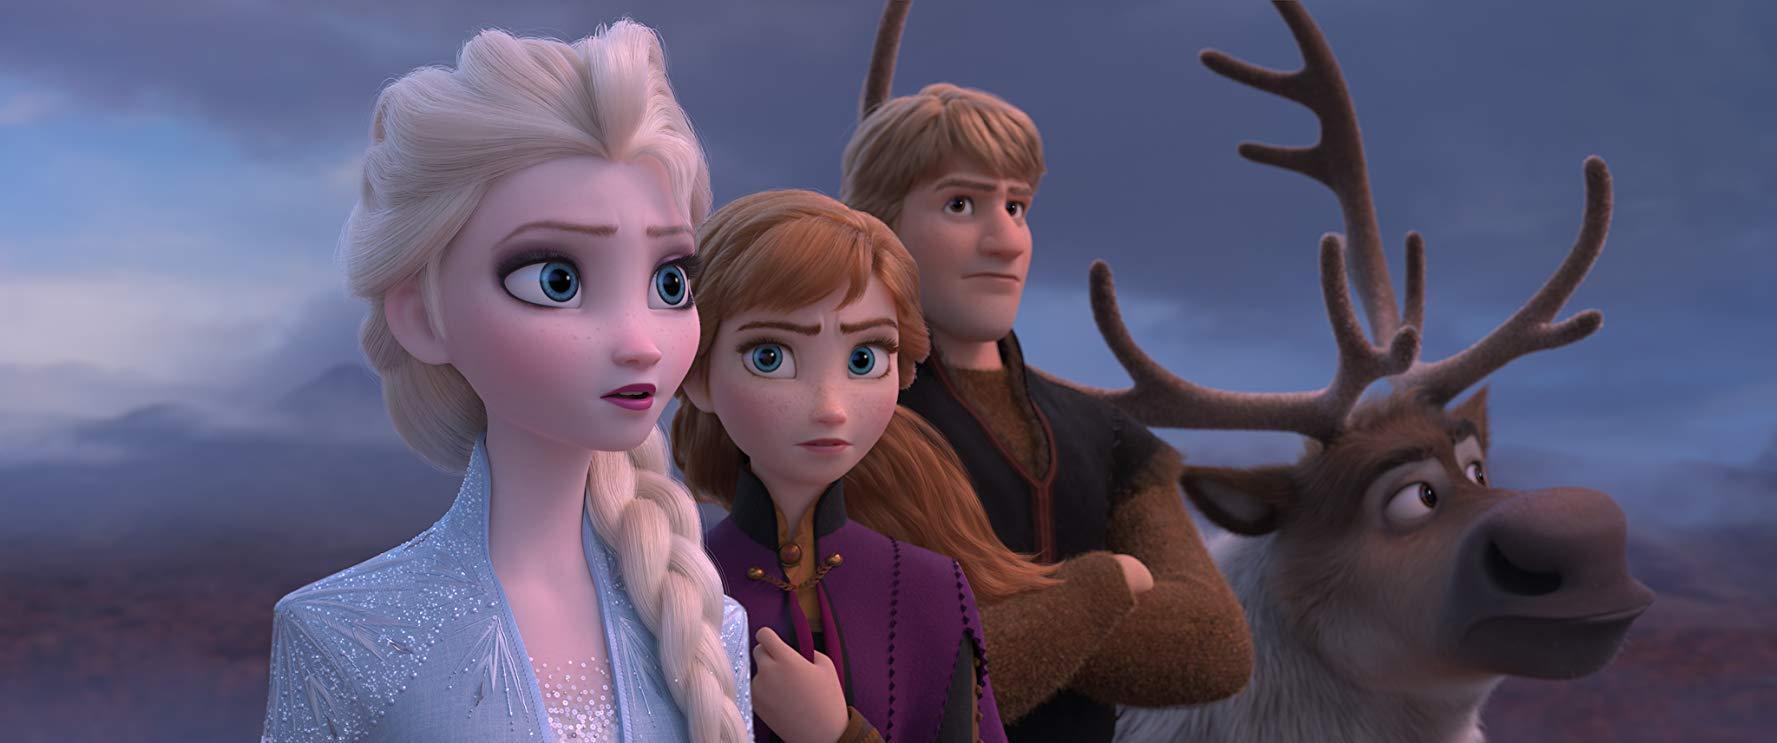 Frozen 2 (Fonte: IMDb/reprodução)